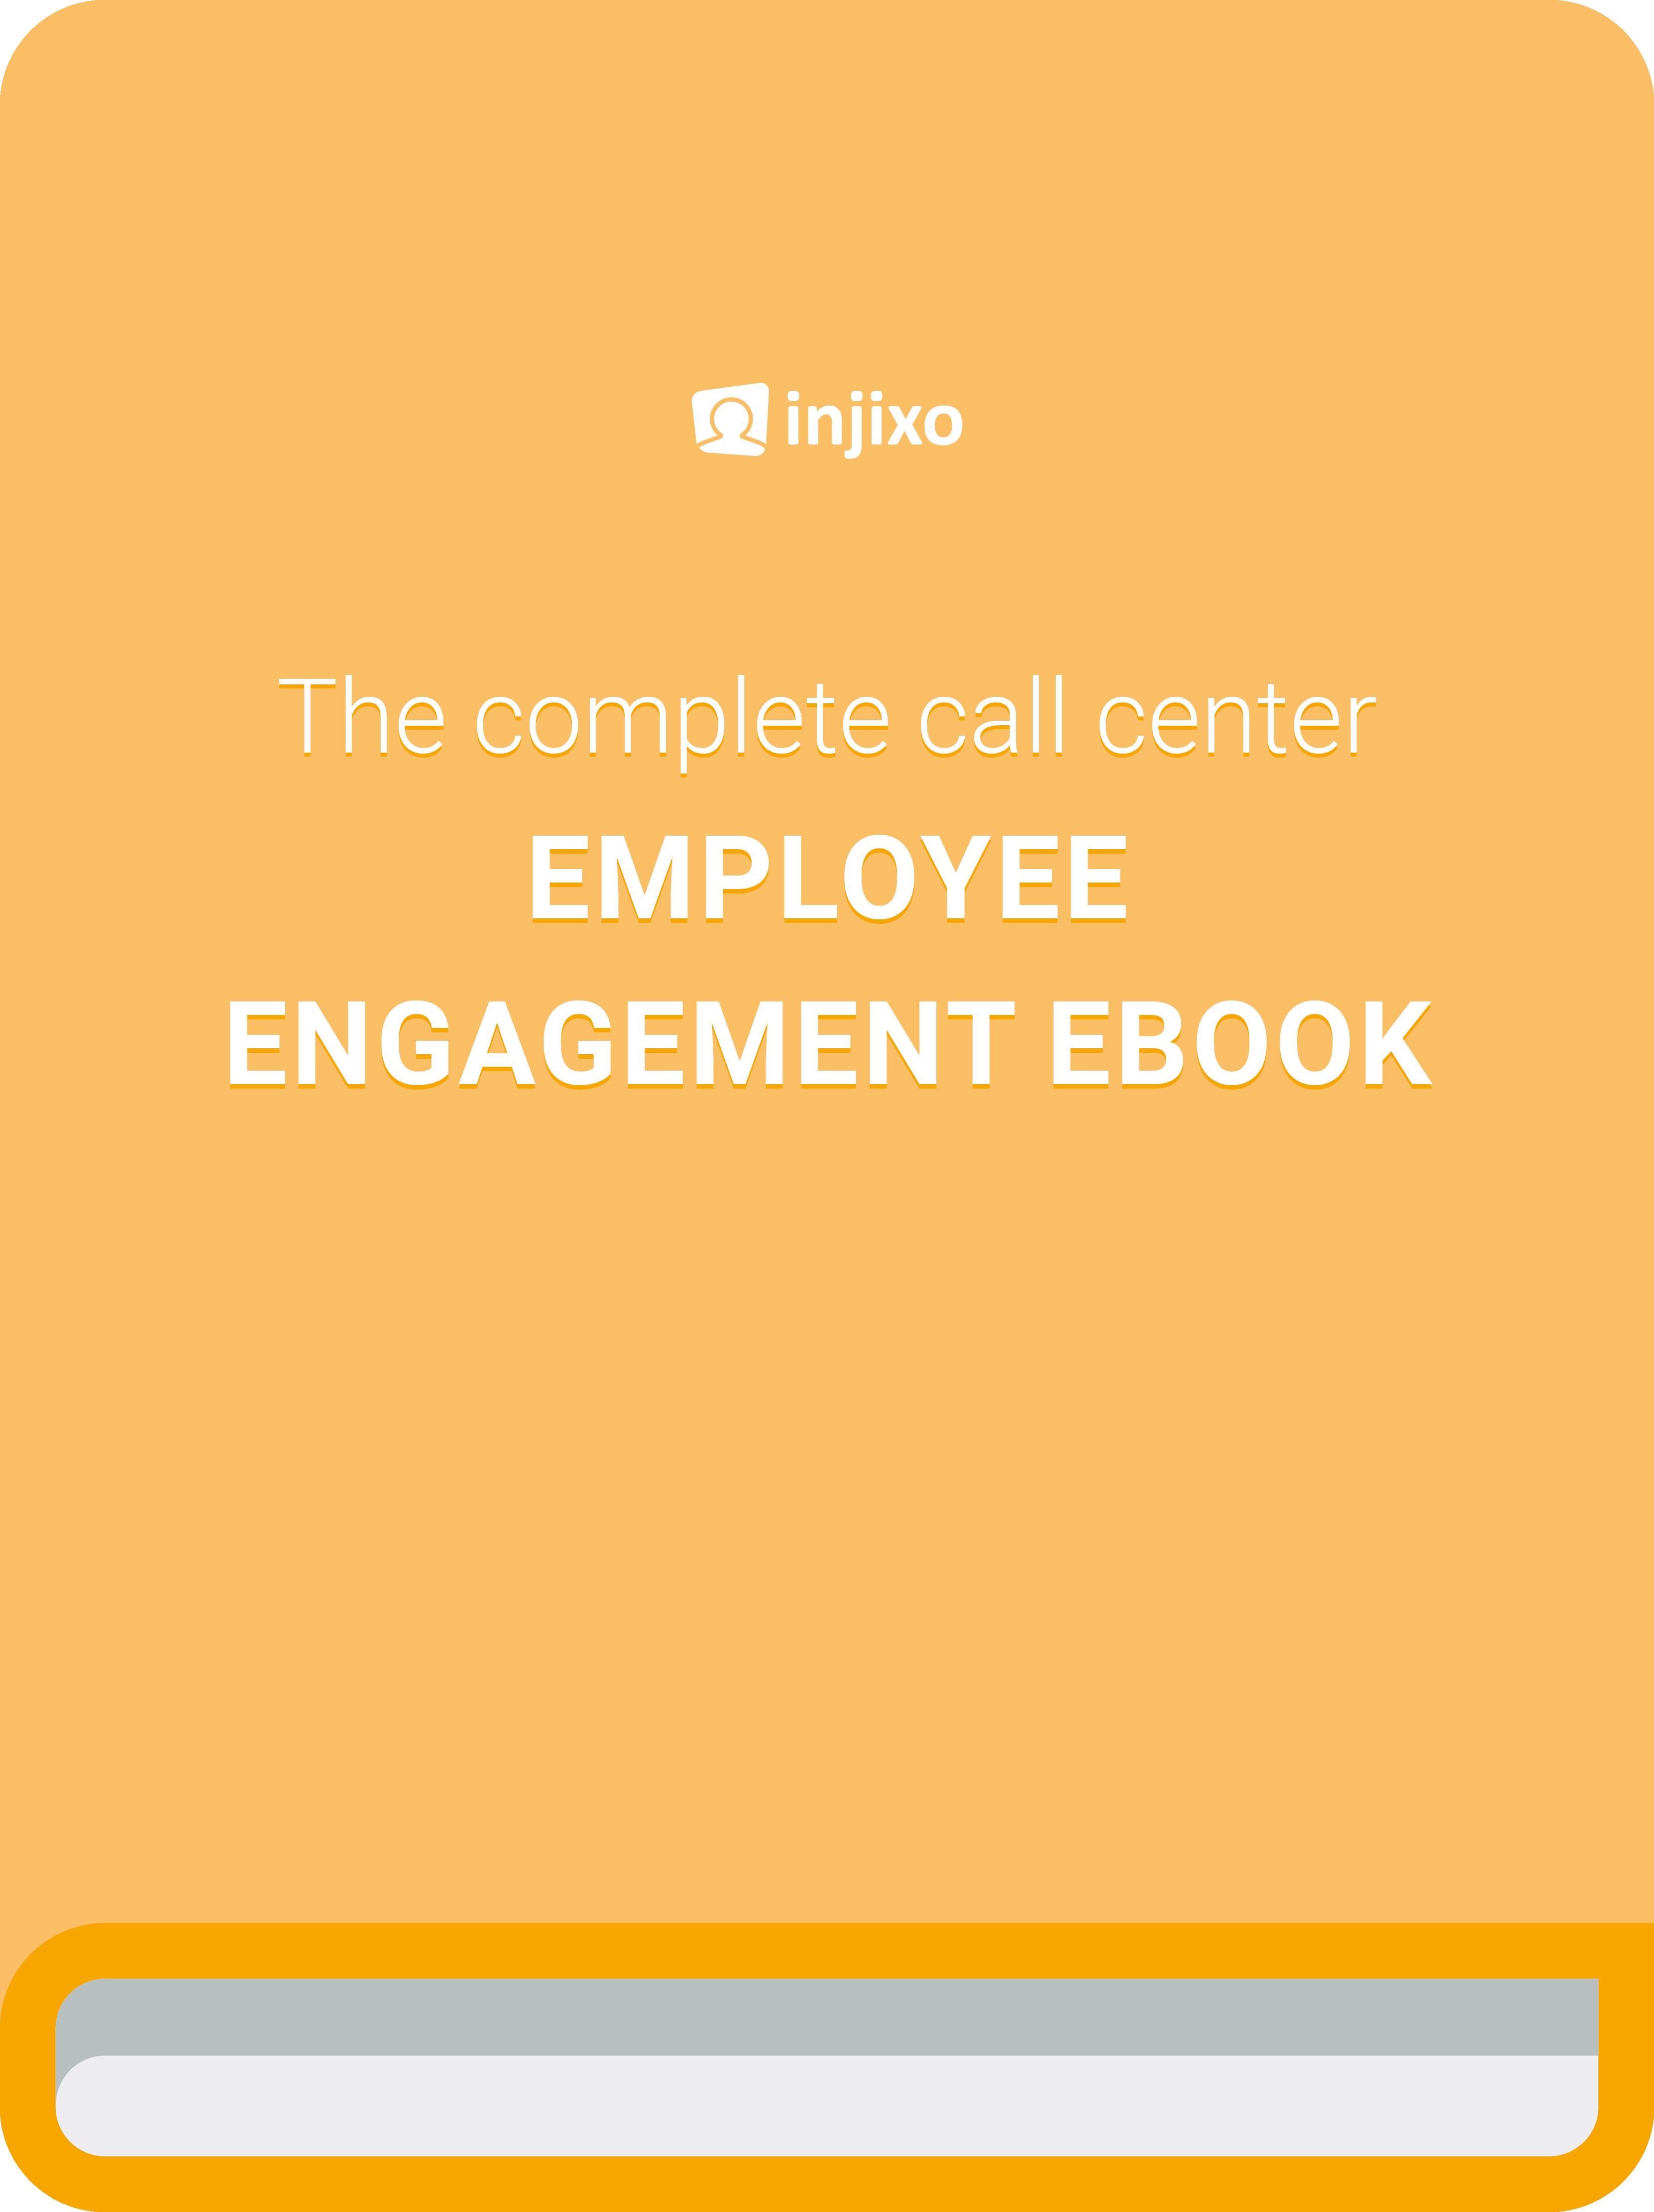 injixo - EN - ebook employee engangement cover.png